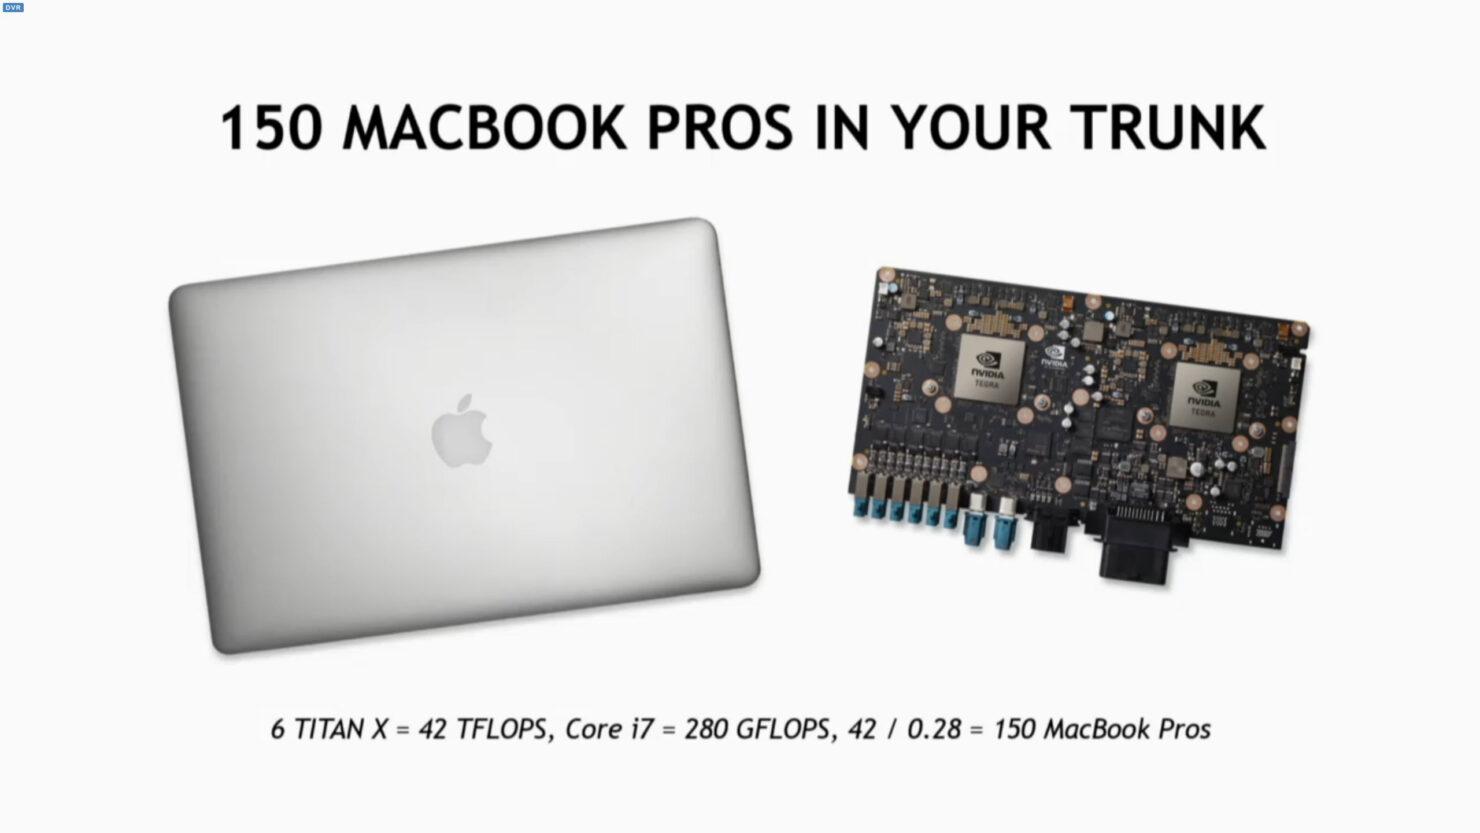 nvidia-drive-px-2-150-macbook-pros